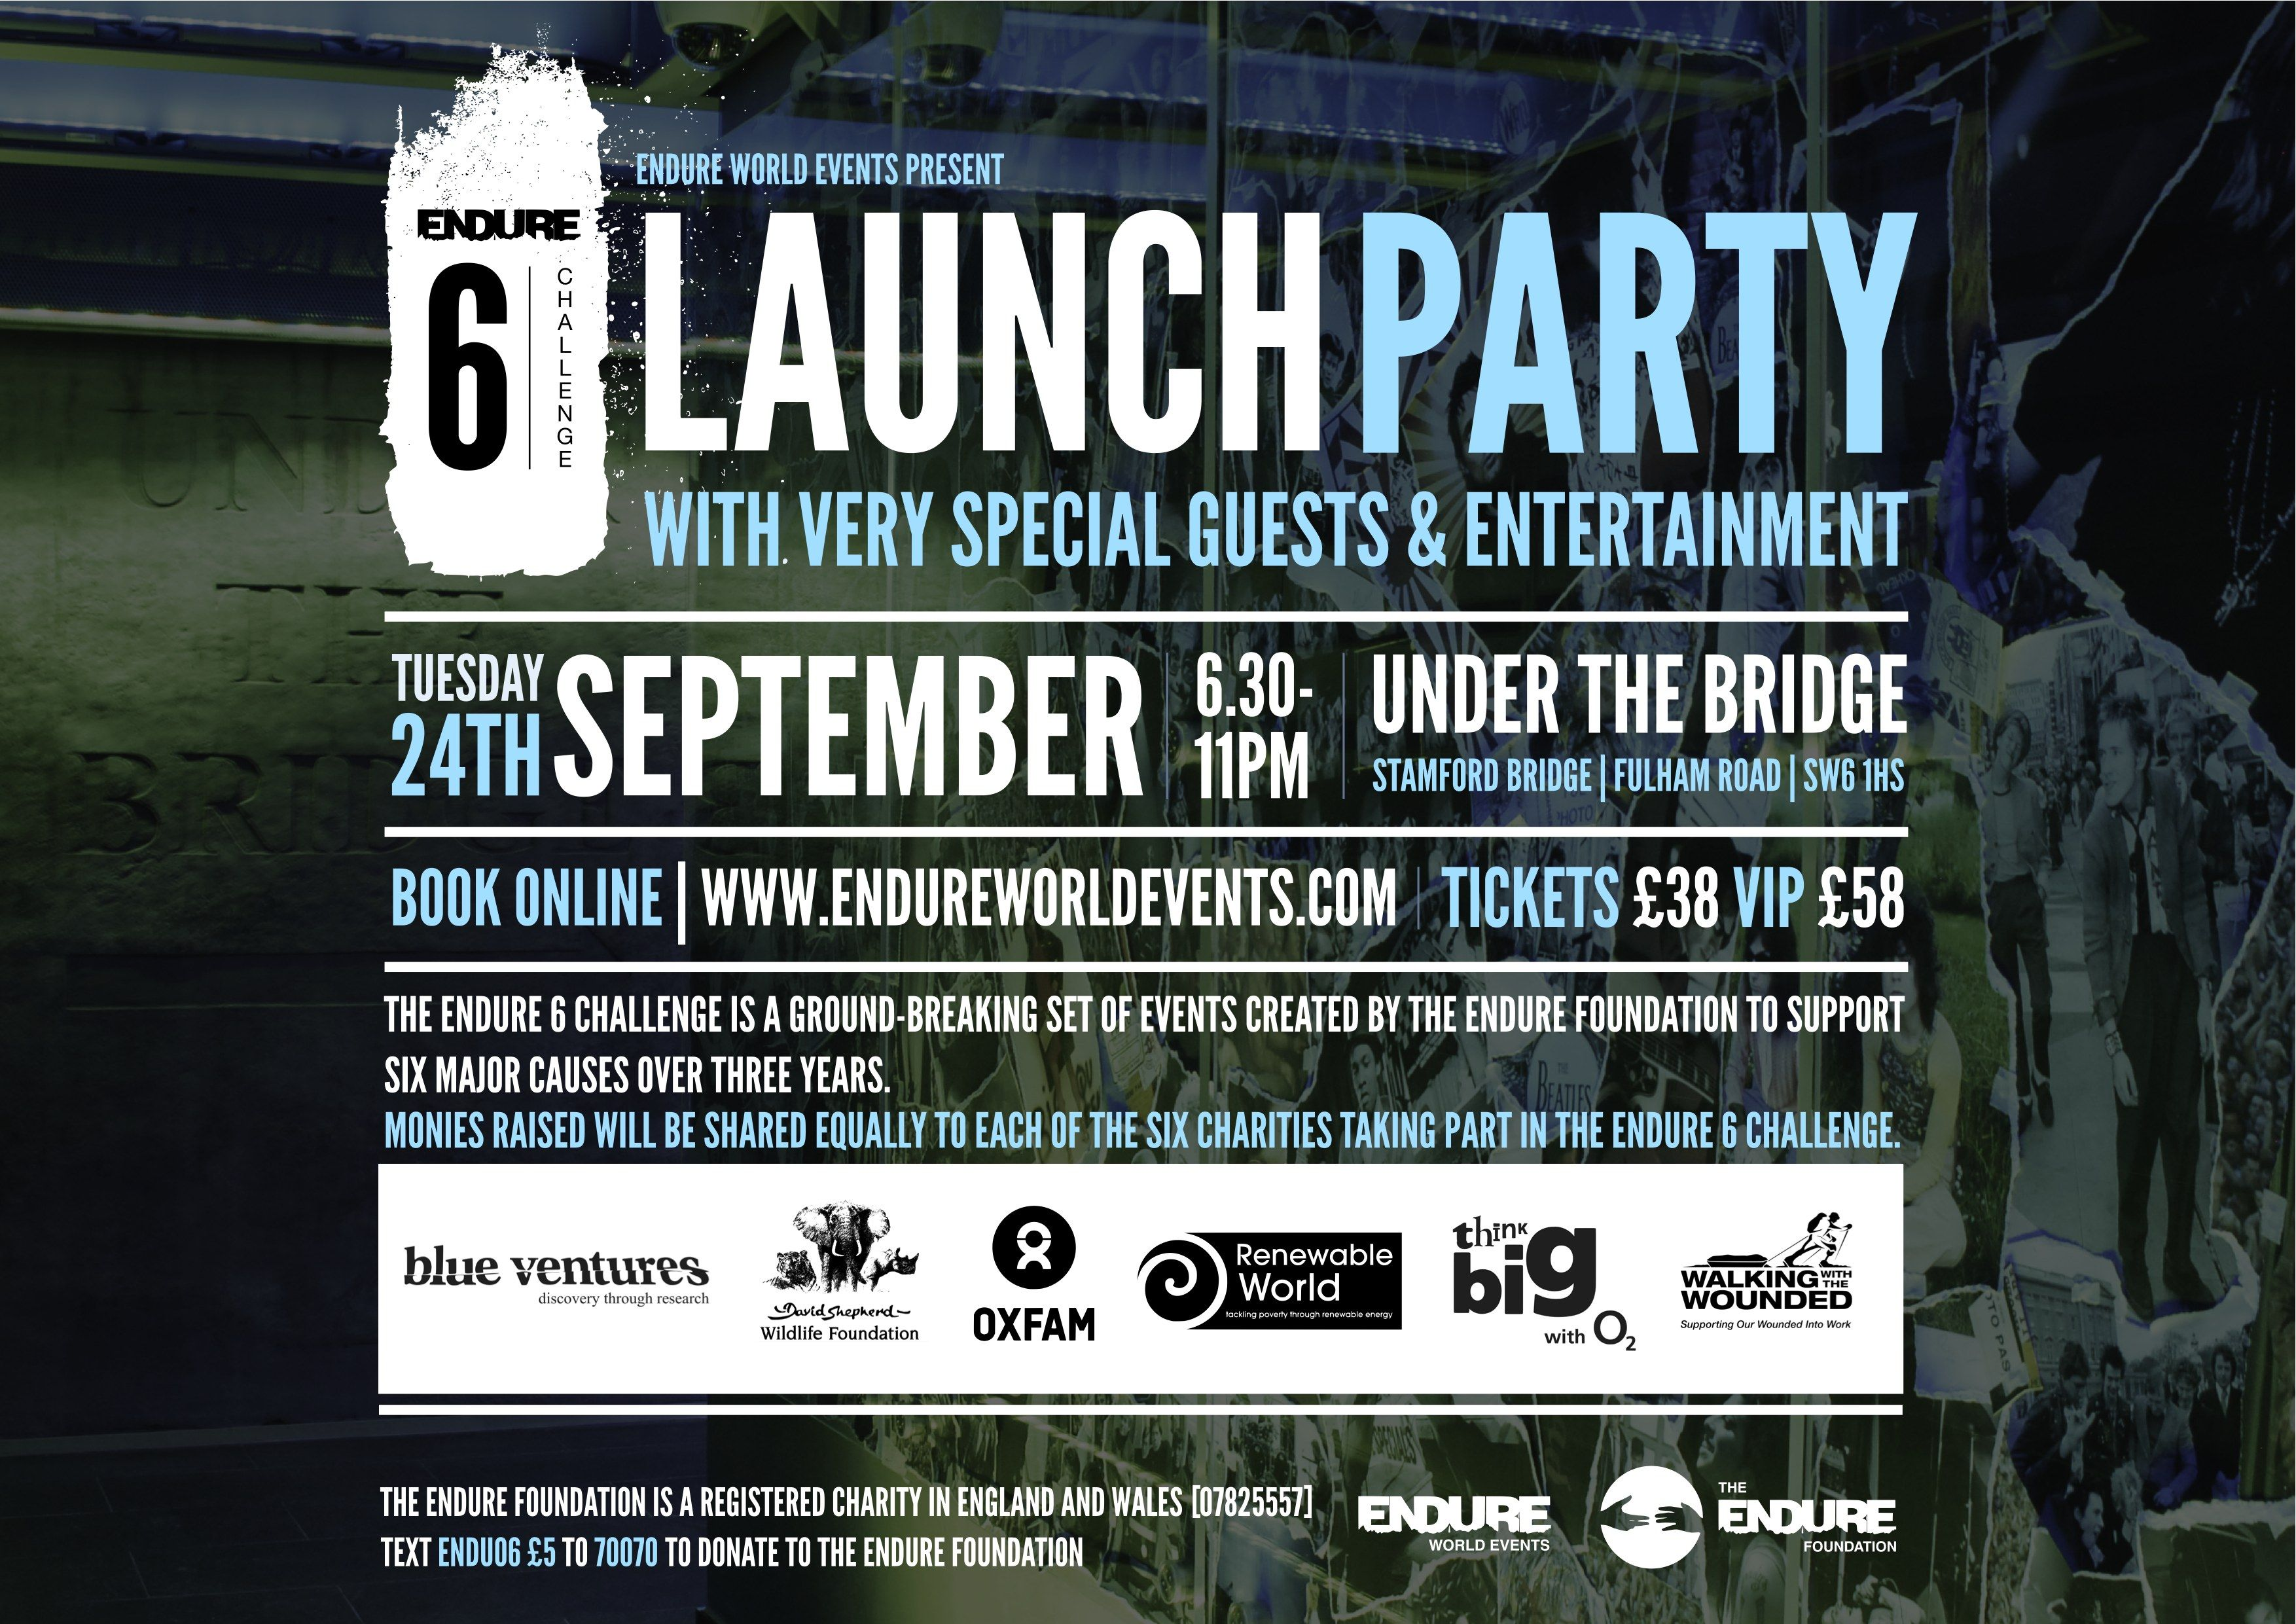 launch event invitation images  invites    launch, party invitations